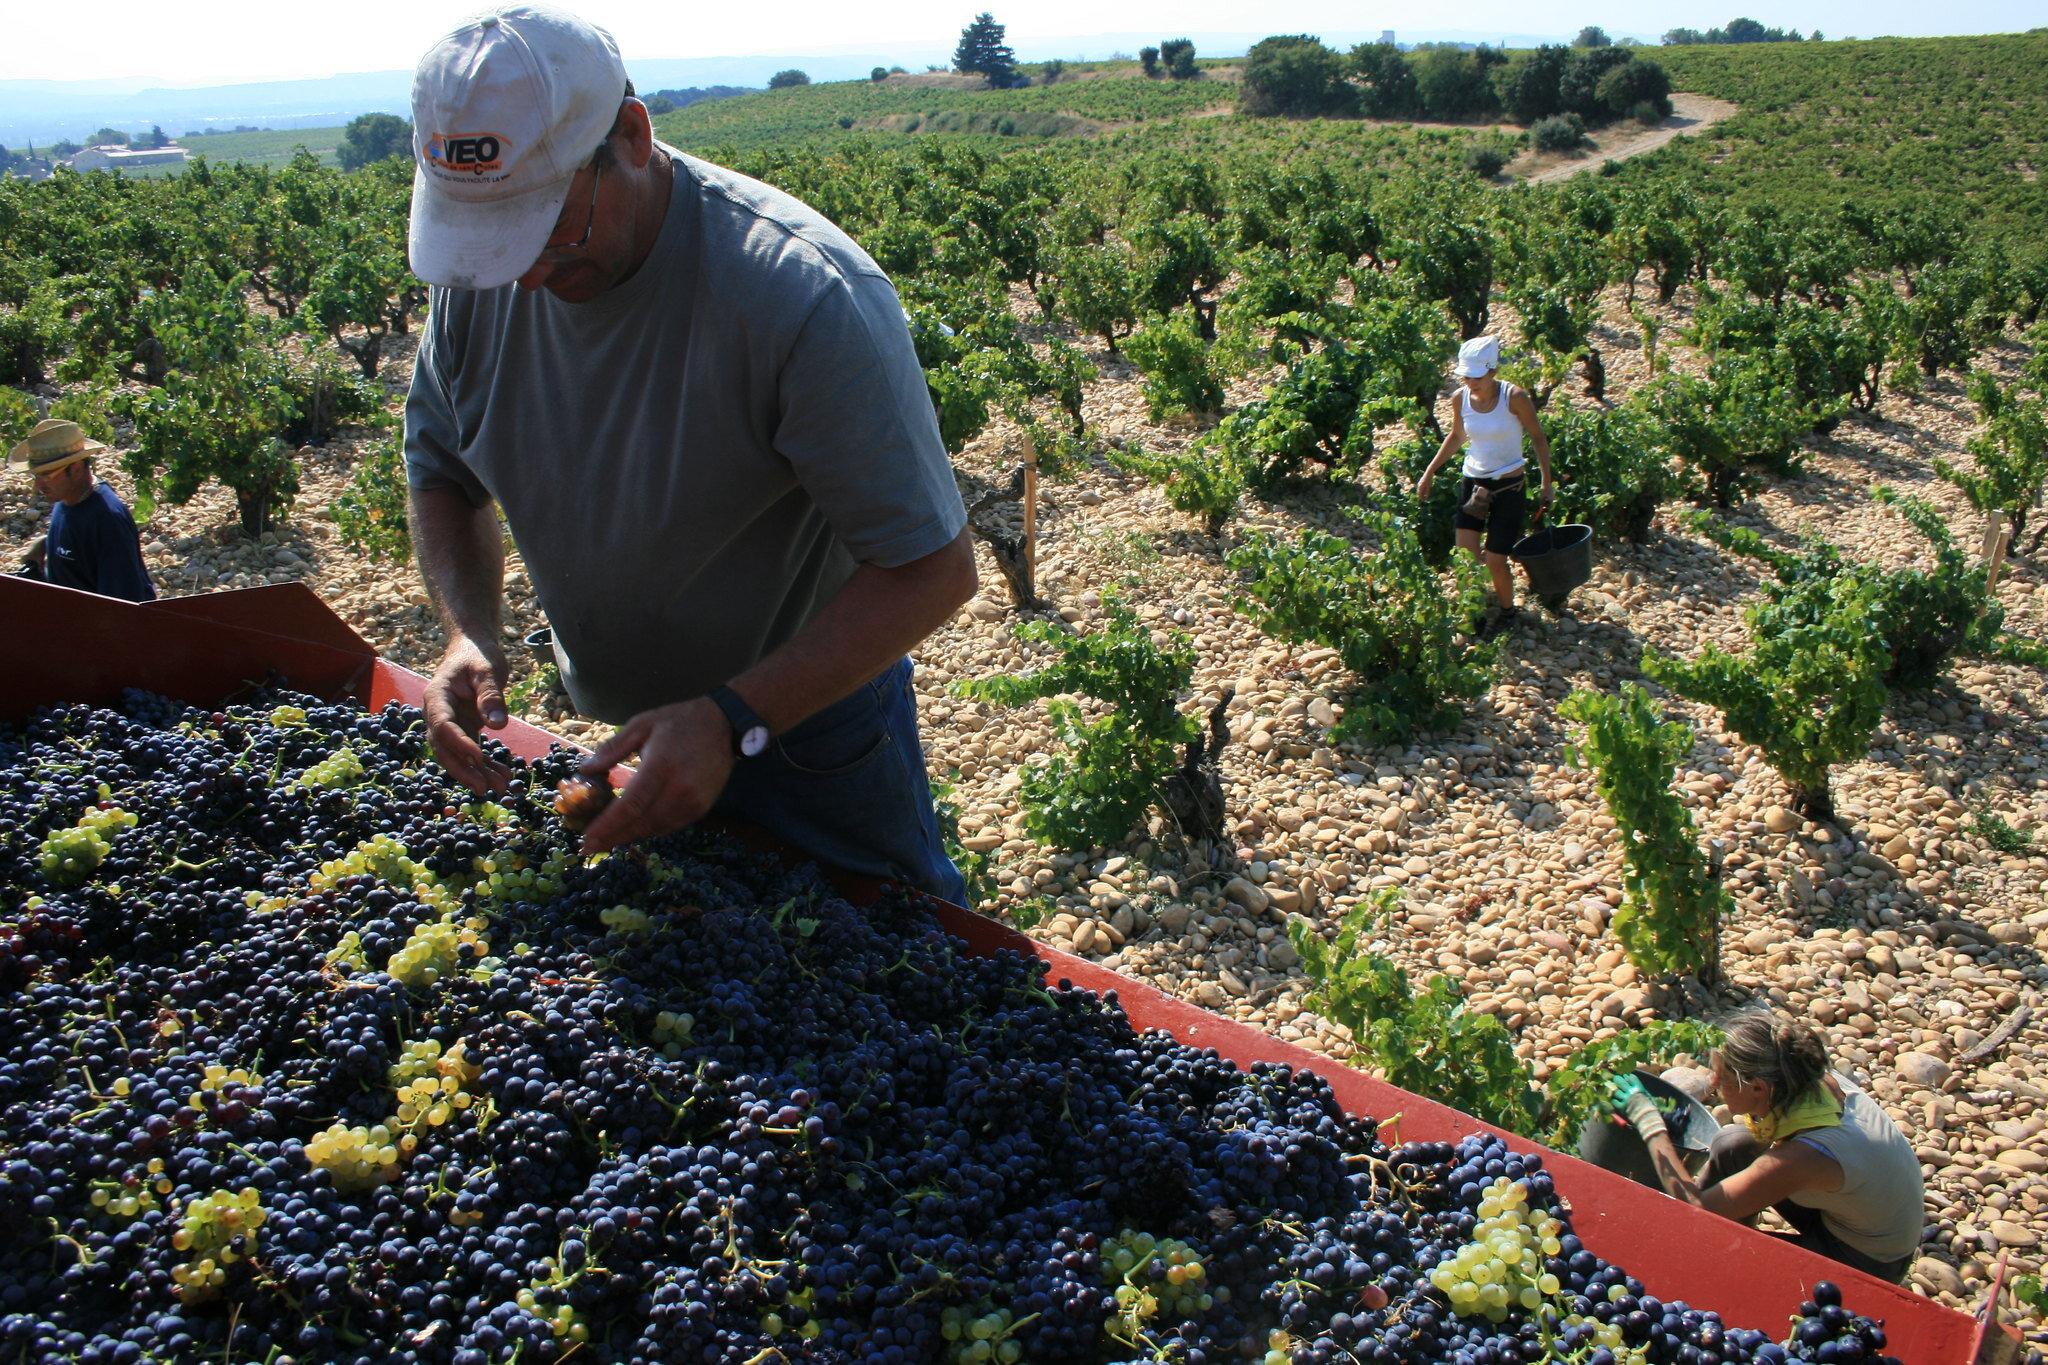 Grape picking at Domaine Roger Sabon, Châteauneuf-du-Pape (photo: Jean-Louis Zimmermann/Flickr)